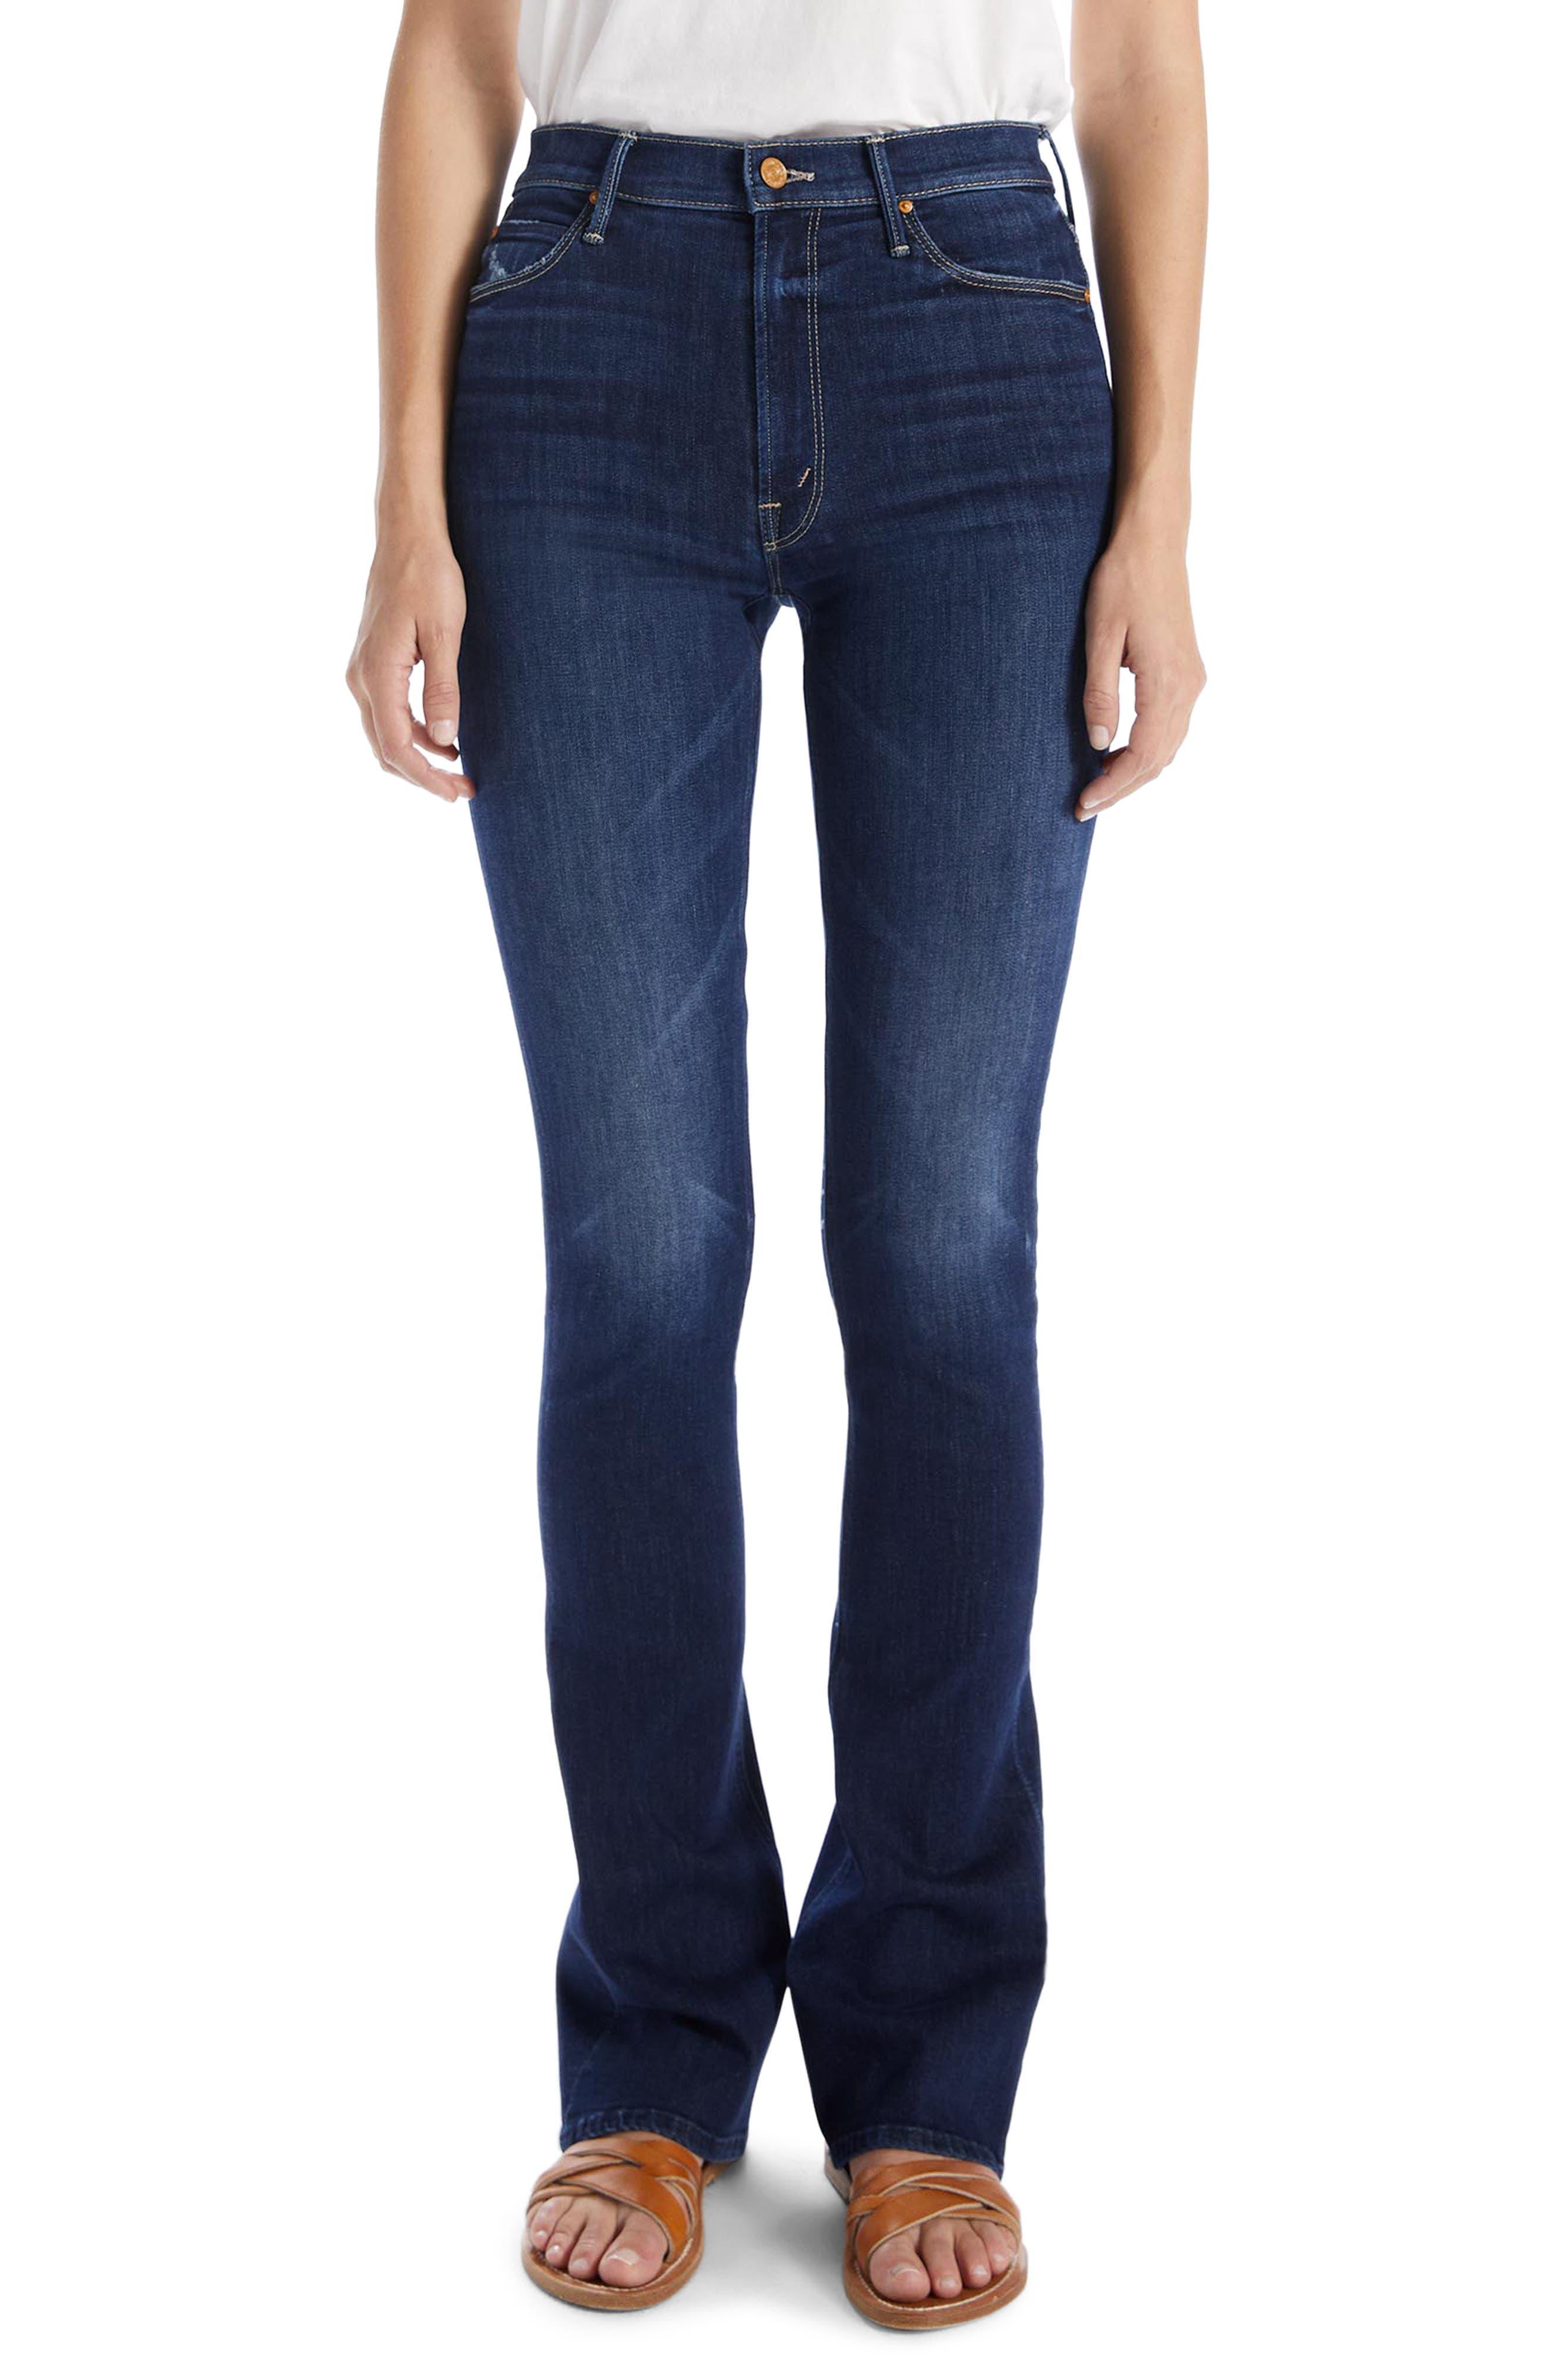 Women's Mother 'Runaway' Bootcut Jeans